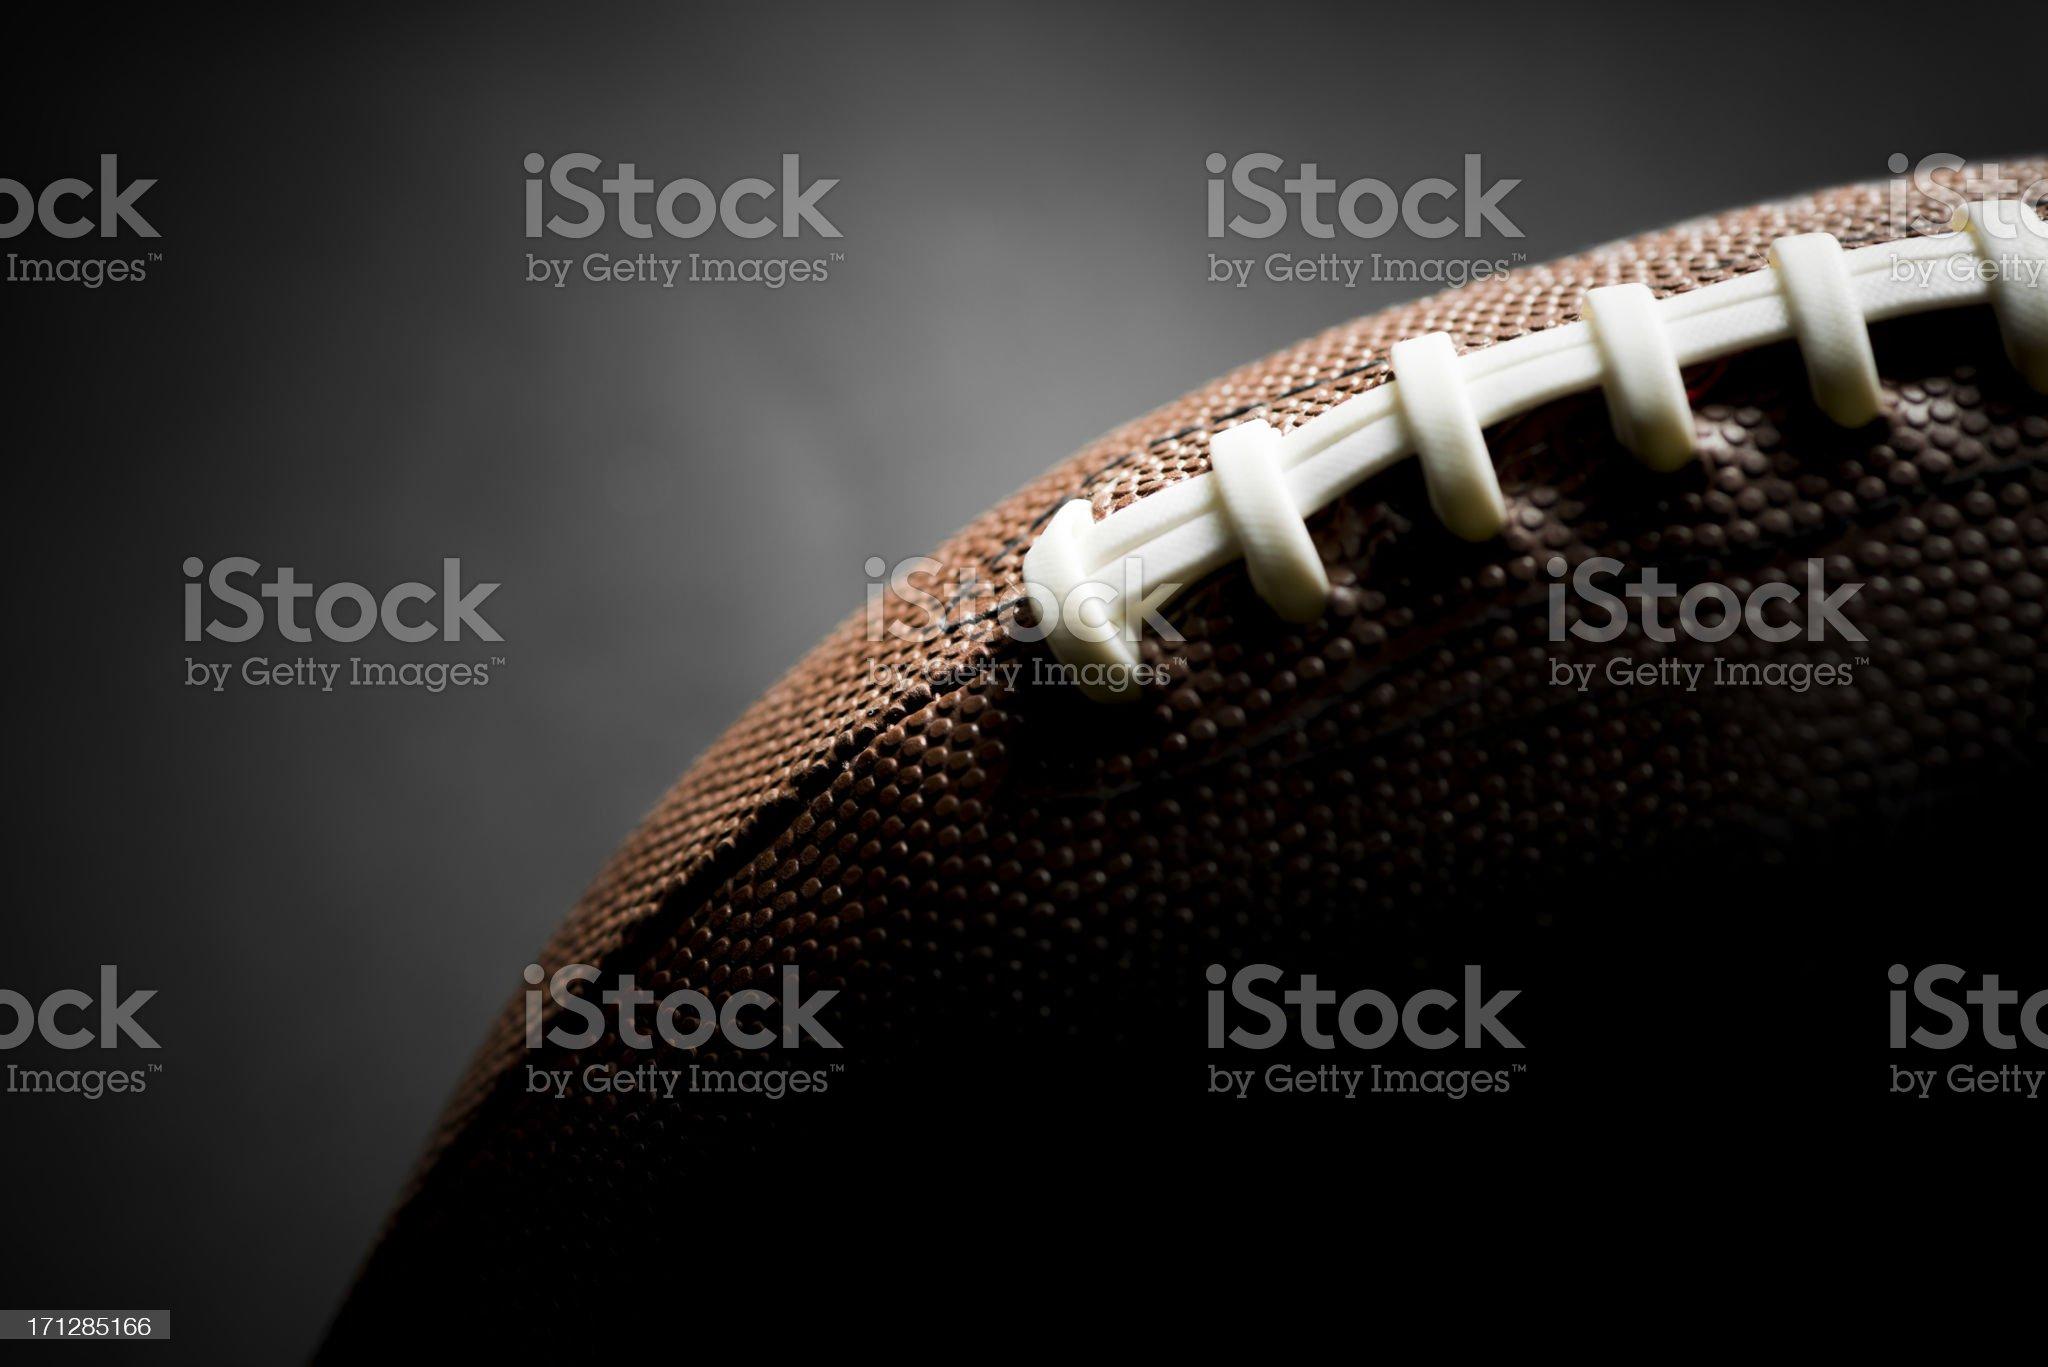 American Football, Black Background royalty-free stock photo